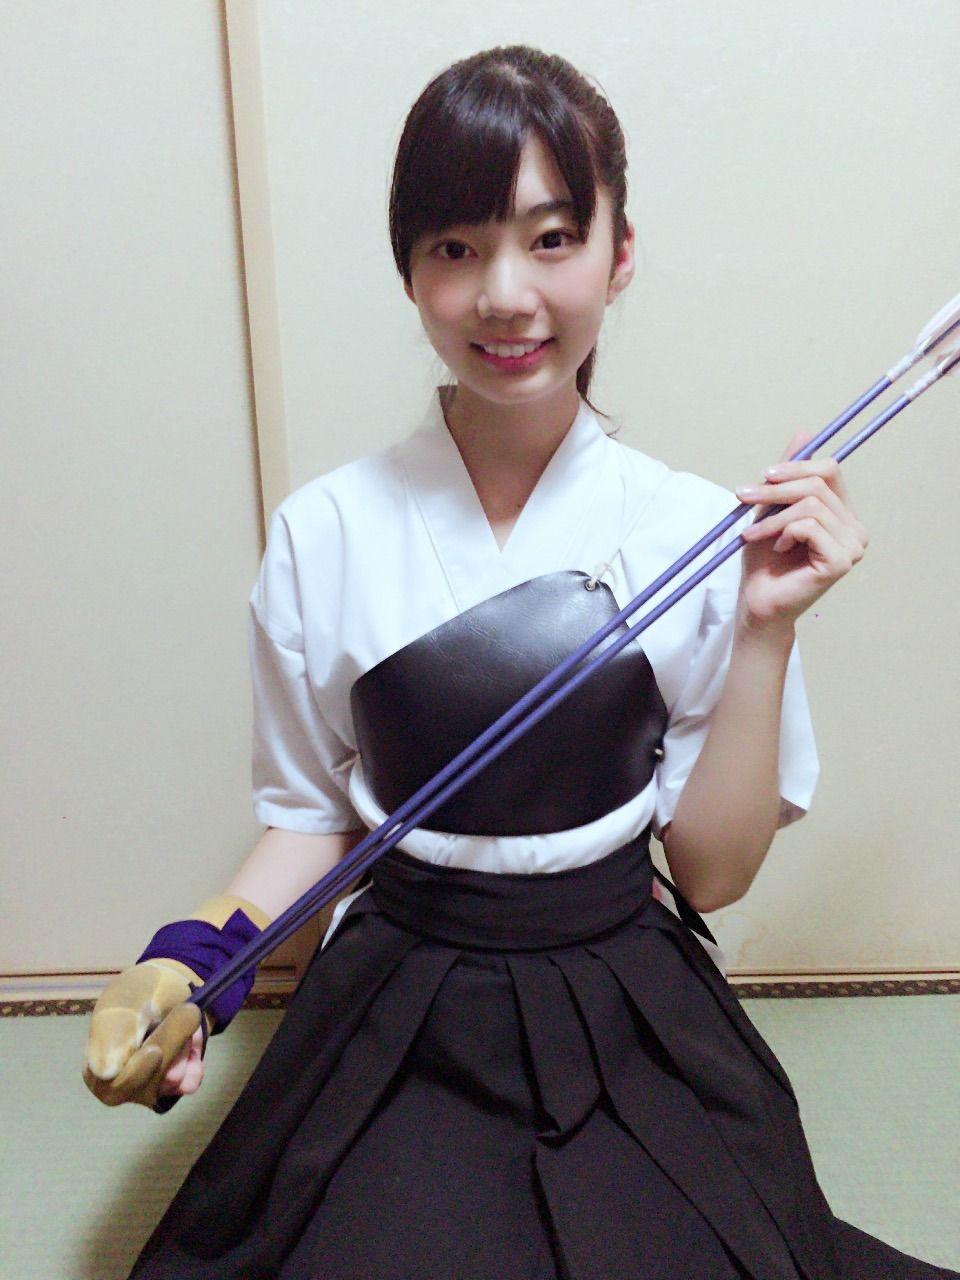 「Kawaii」おしゃれまとめの人気アイデア|Pinterest|Tonharn TL